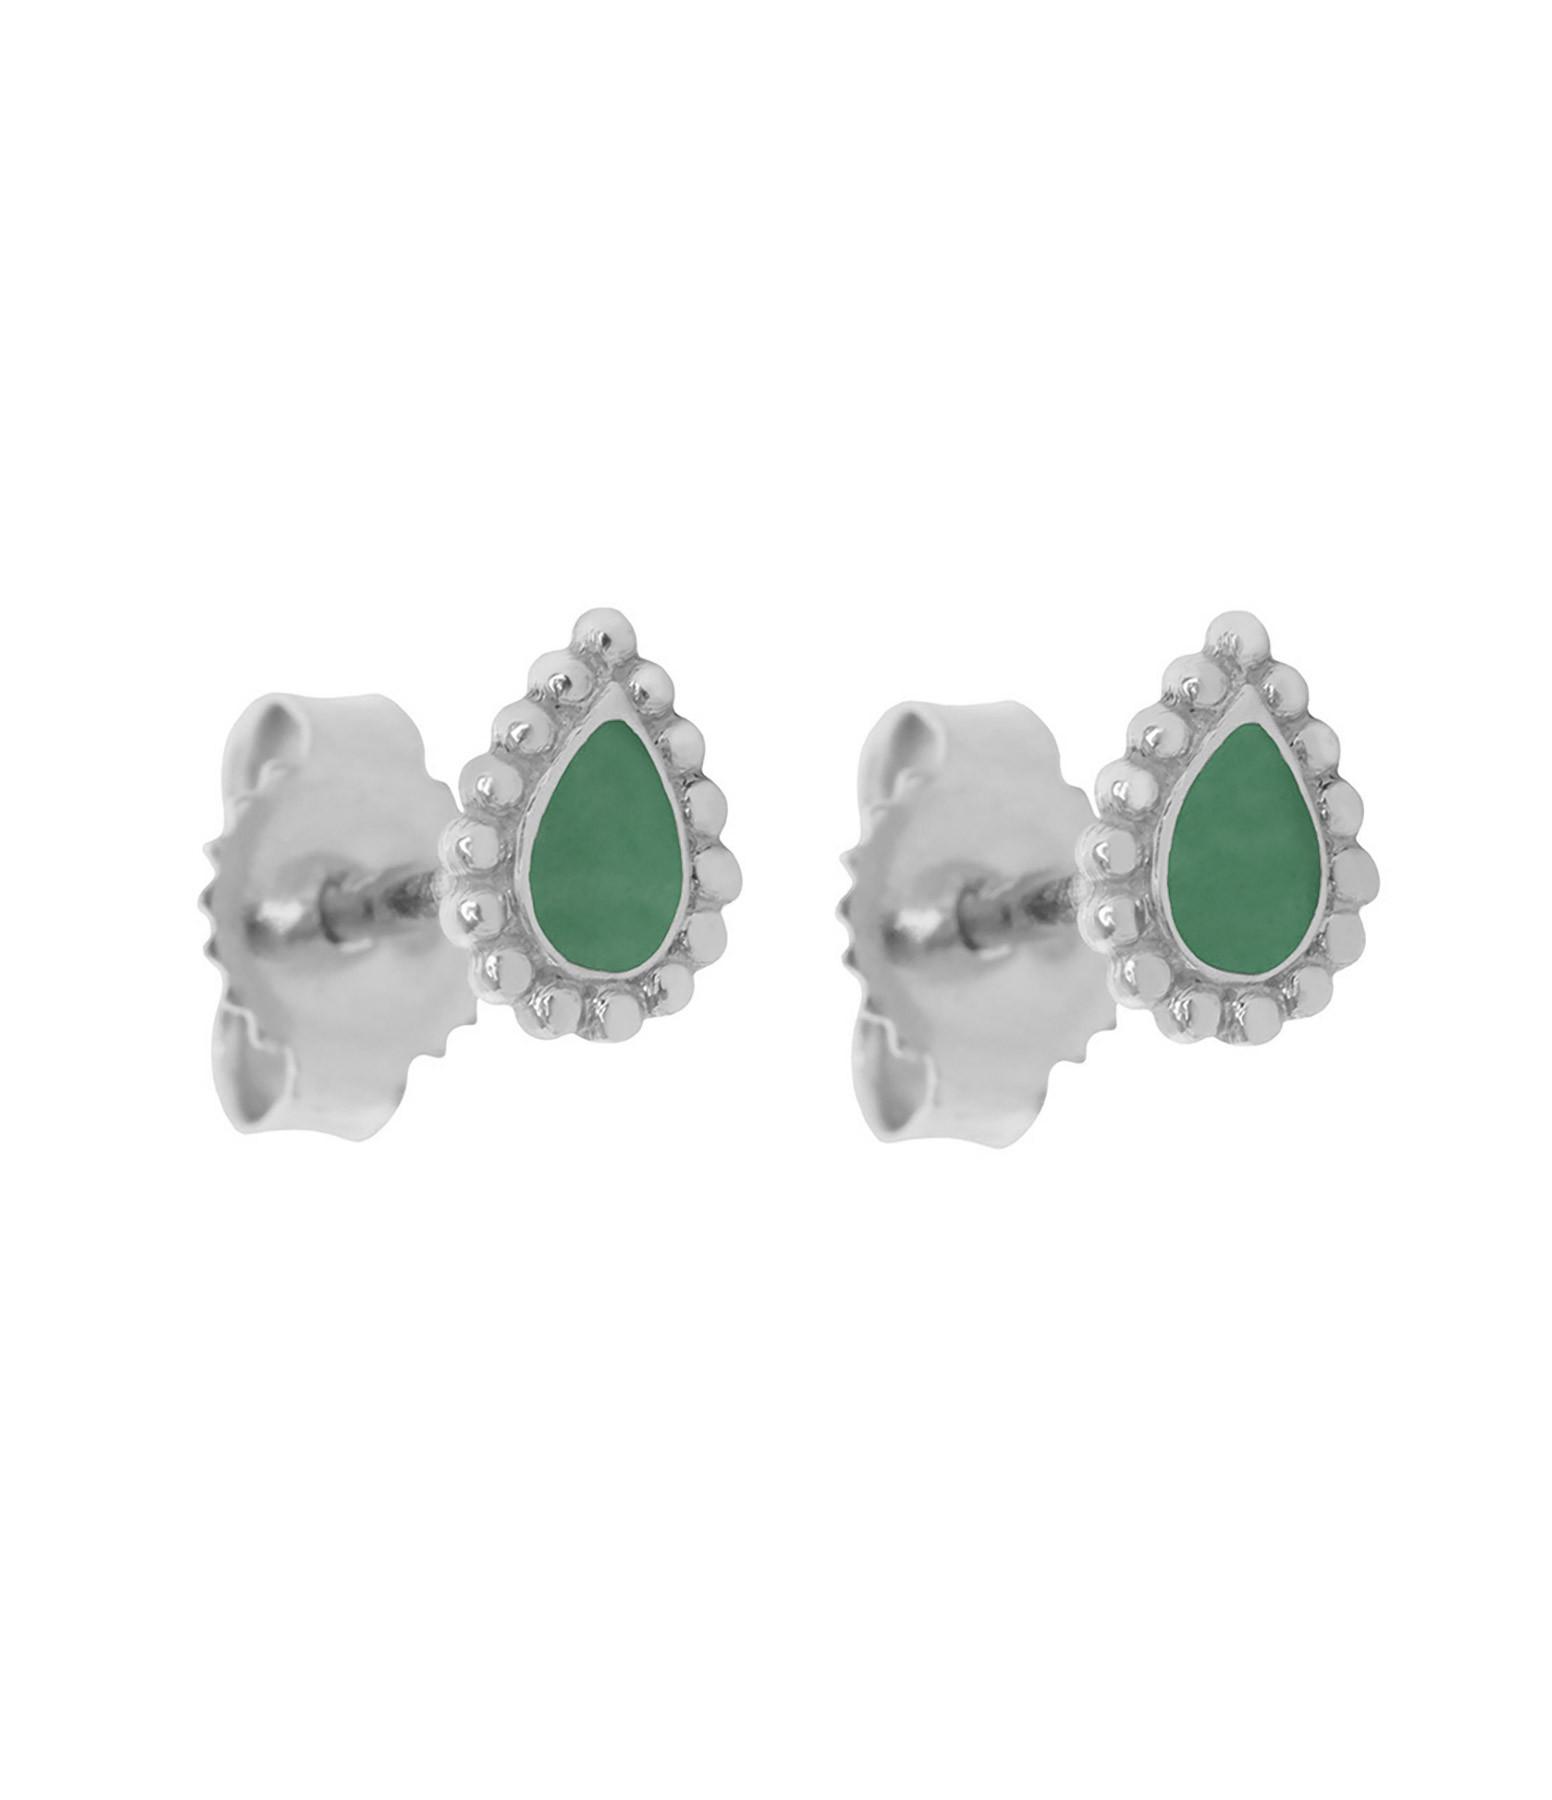 GIGI CLOZEAU - Boucles d'oreilles Lucky Cachemire Email OG